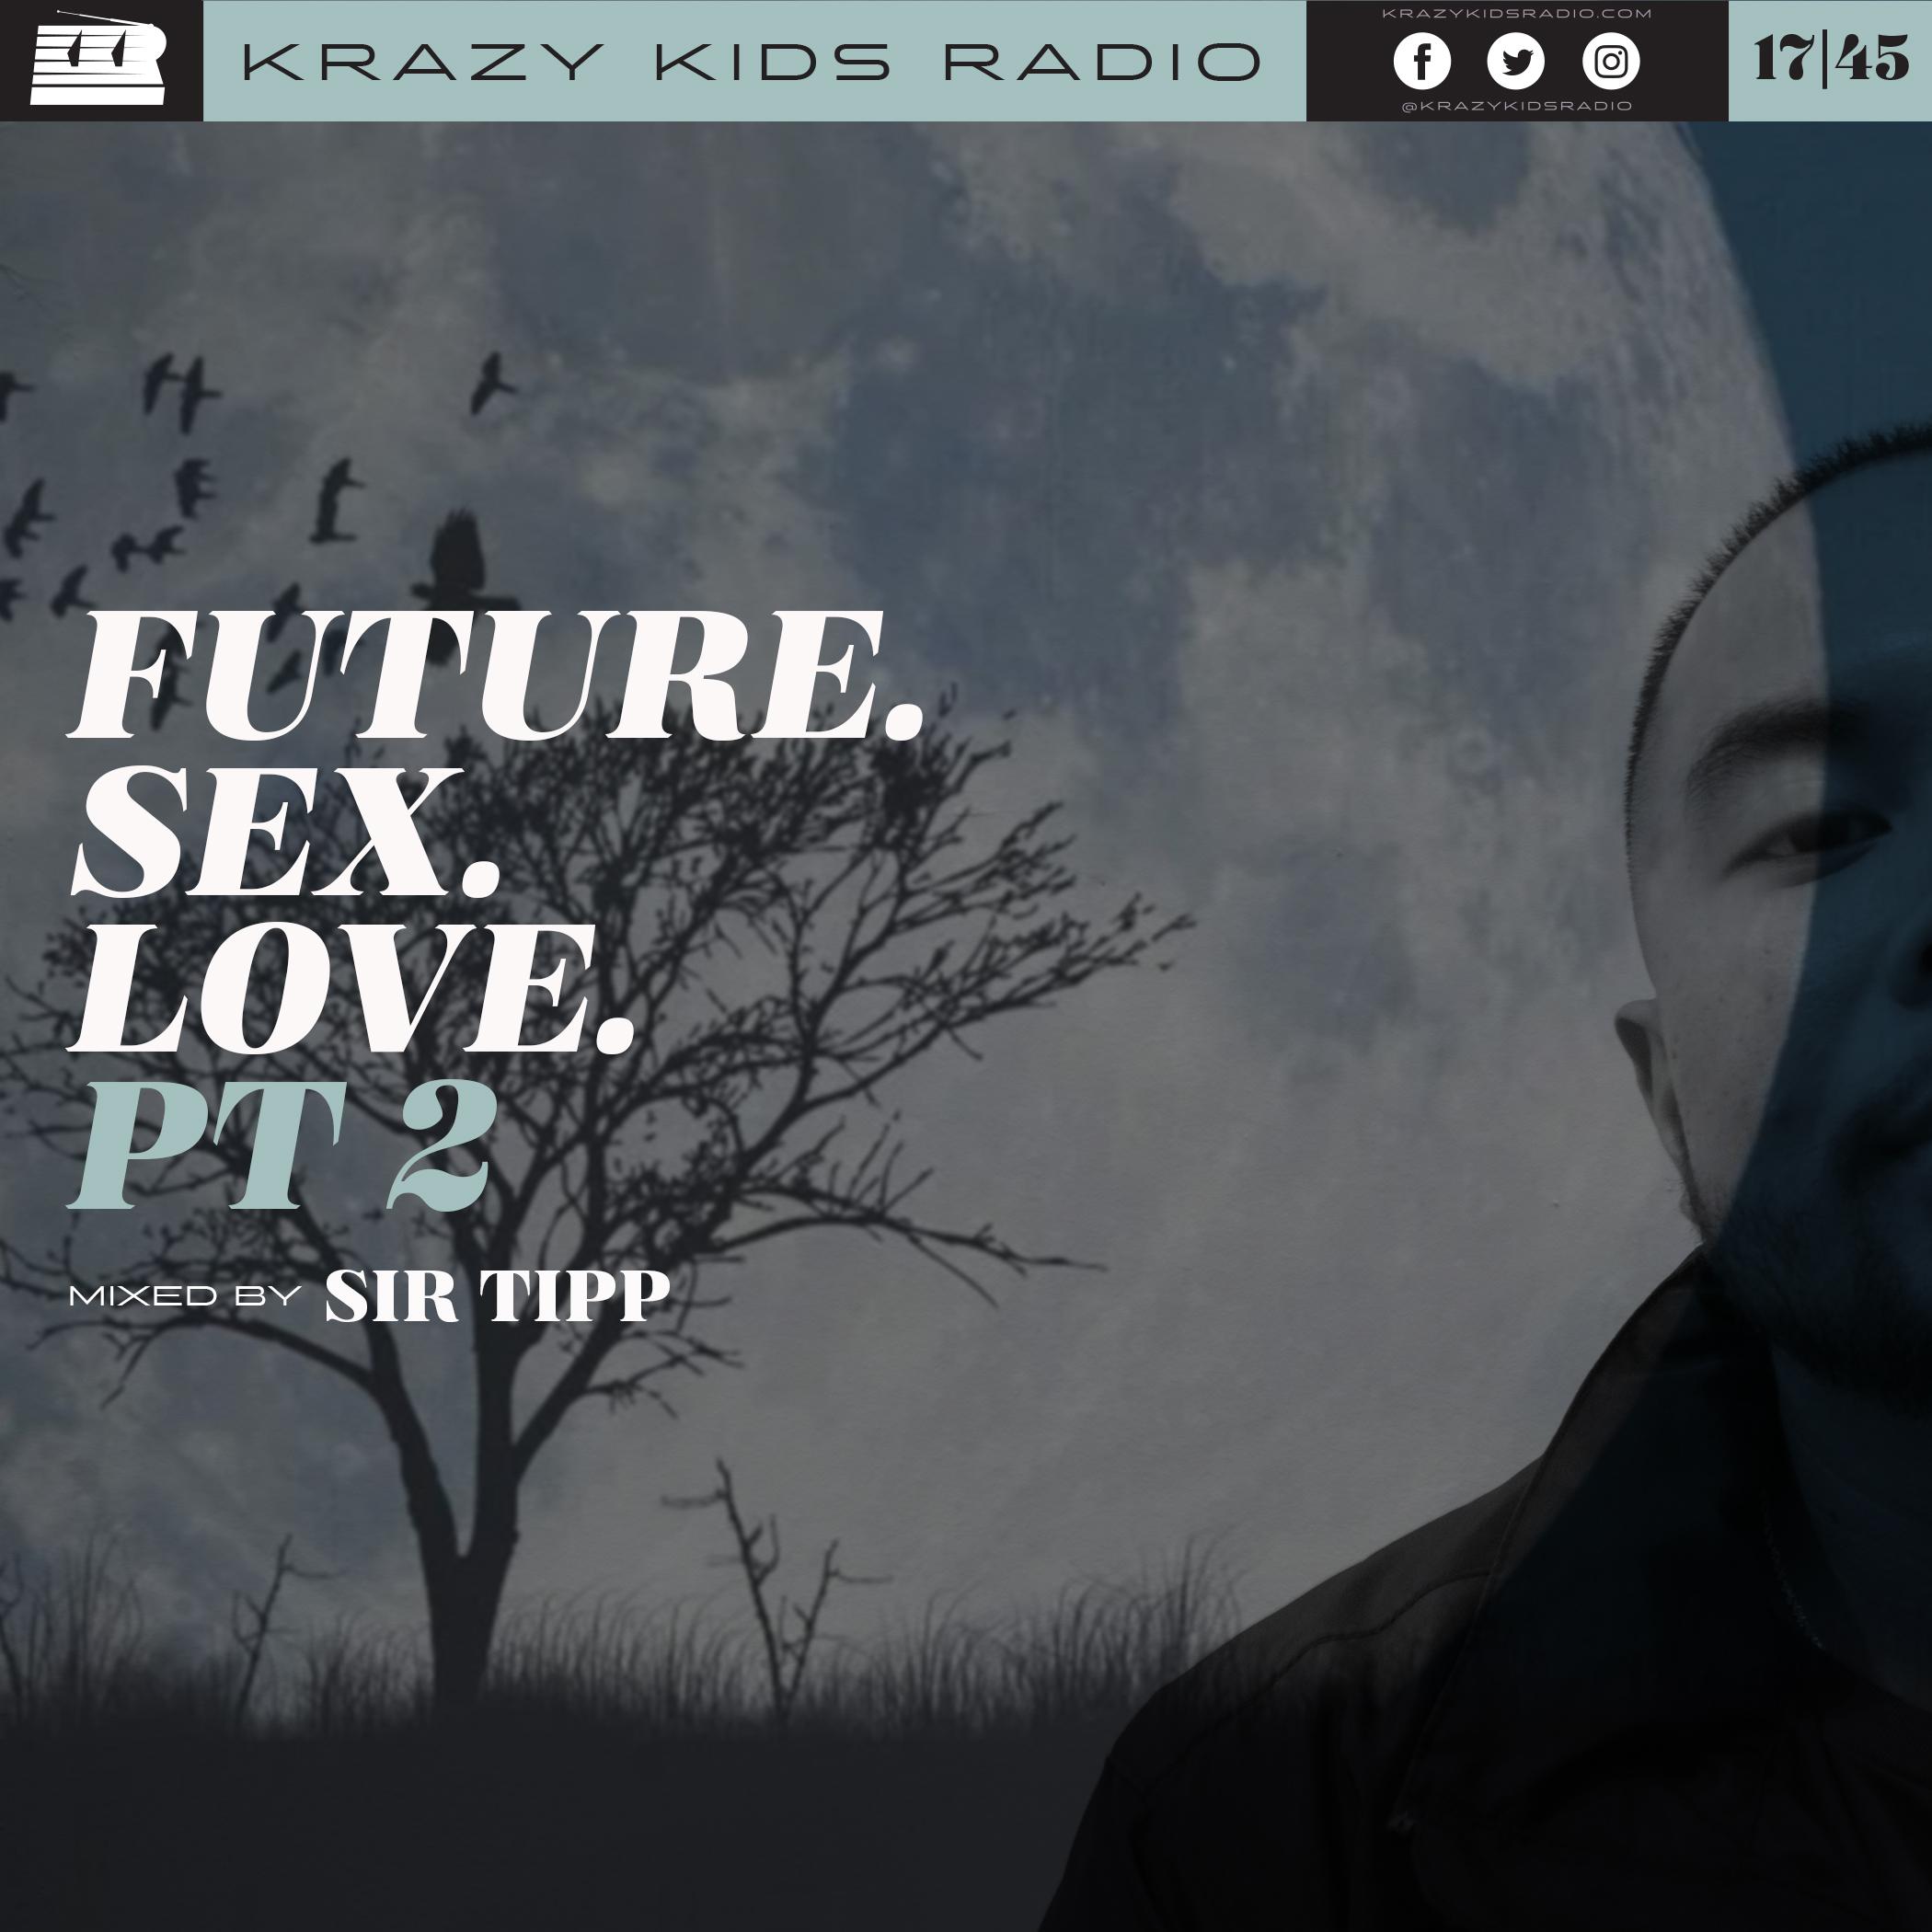 KKR_FUTURE-SEX-LOVE-PT-2.jpg